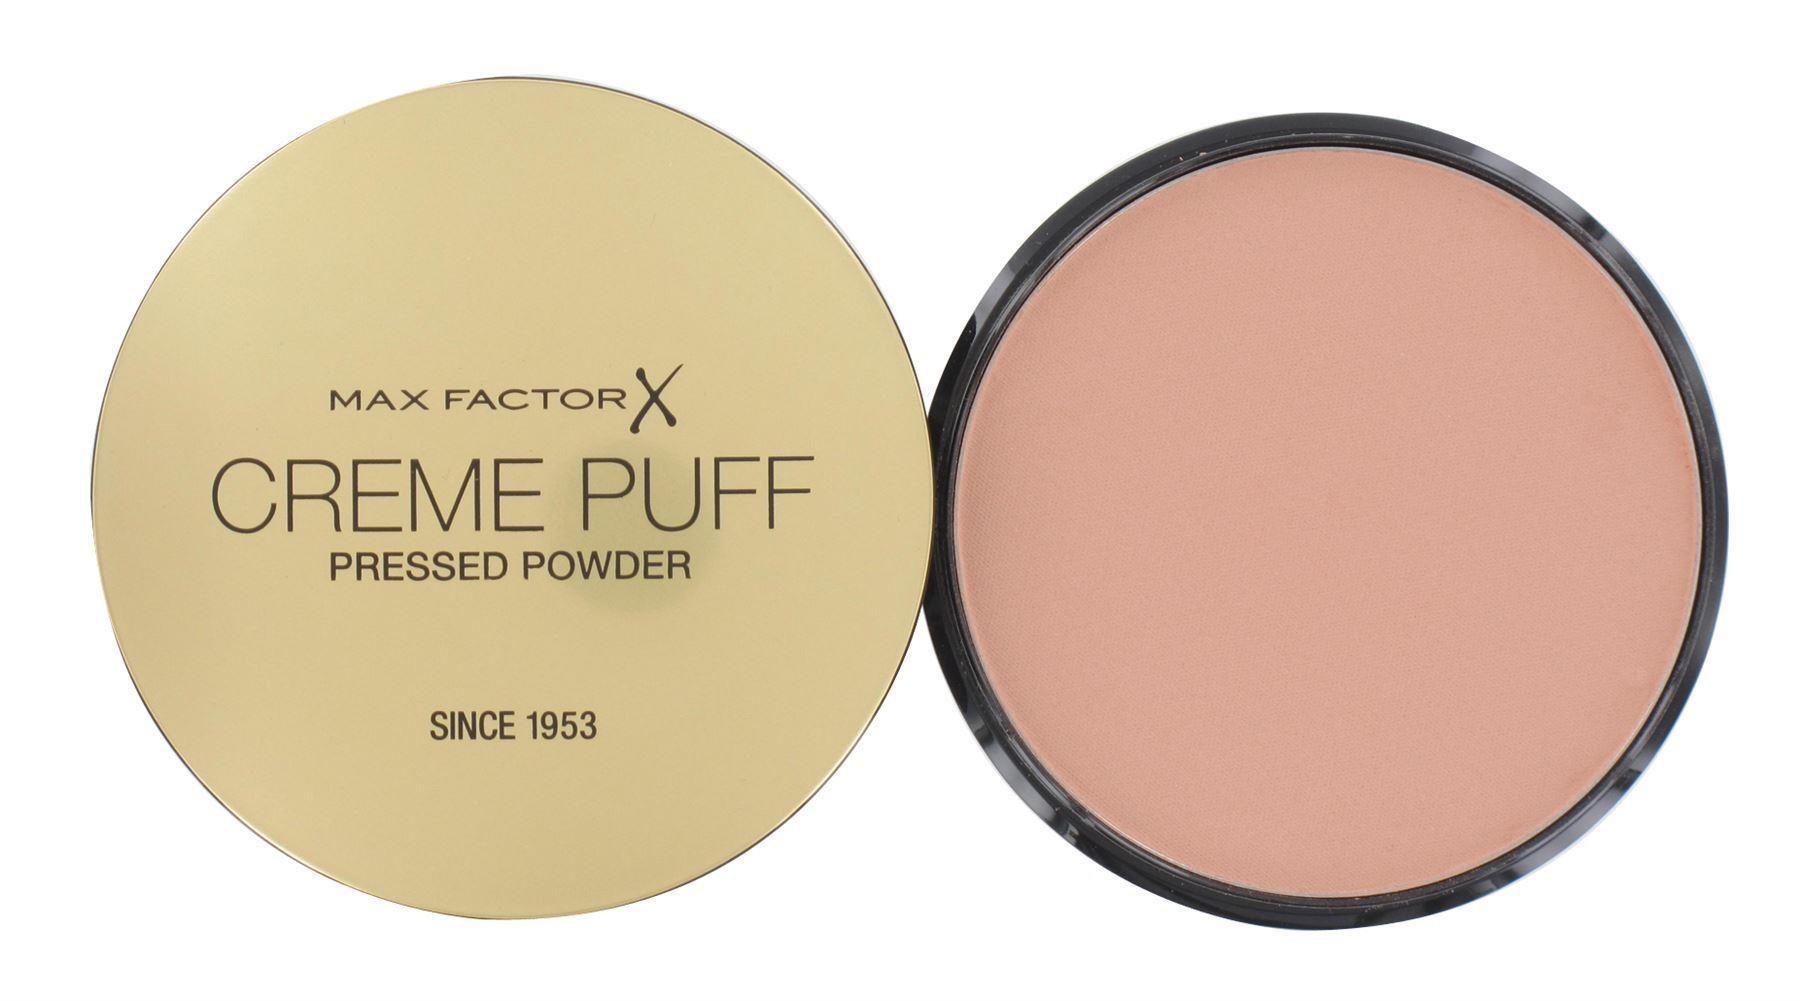 Fabriksnye Max Factor Creme Puff Compact Powder Foundation 21g - 59 Gay Whisper YF-27